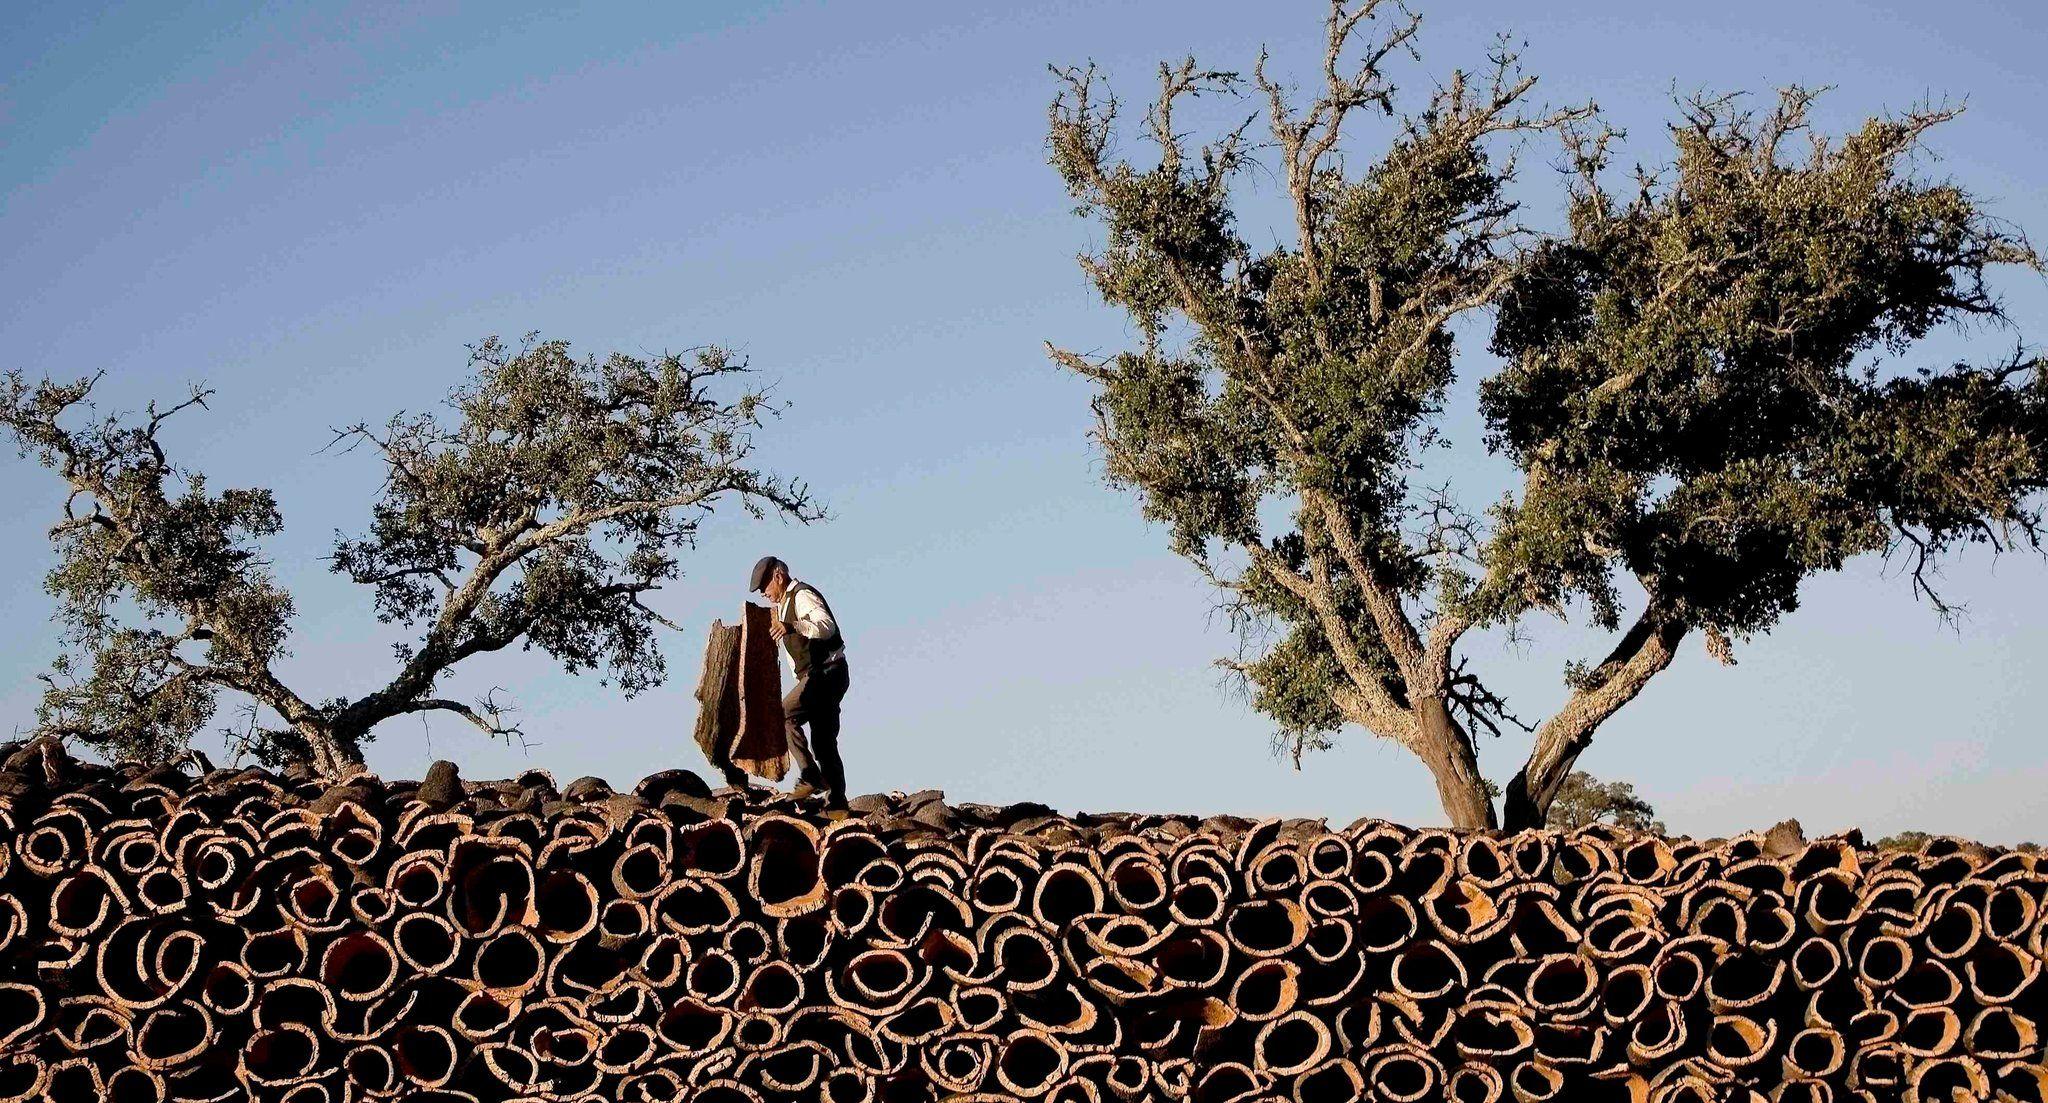 Cork Harvesting In 2019 The Story Of Ferdinand Cork Tree Cork